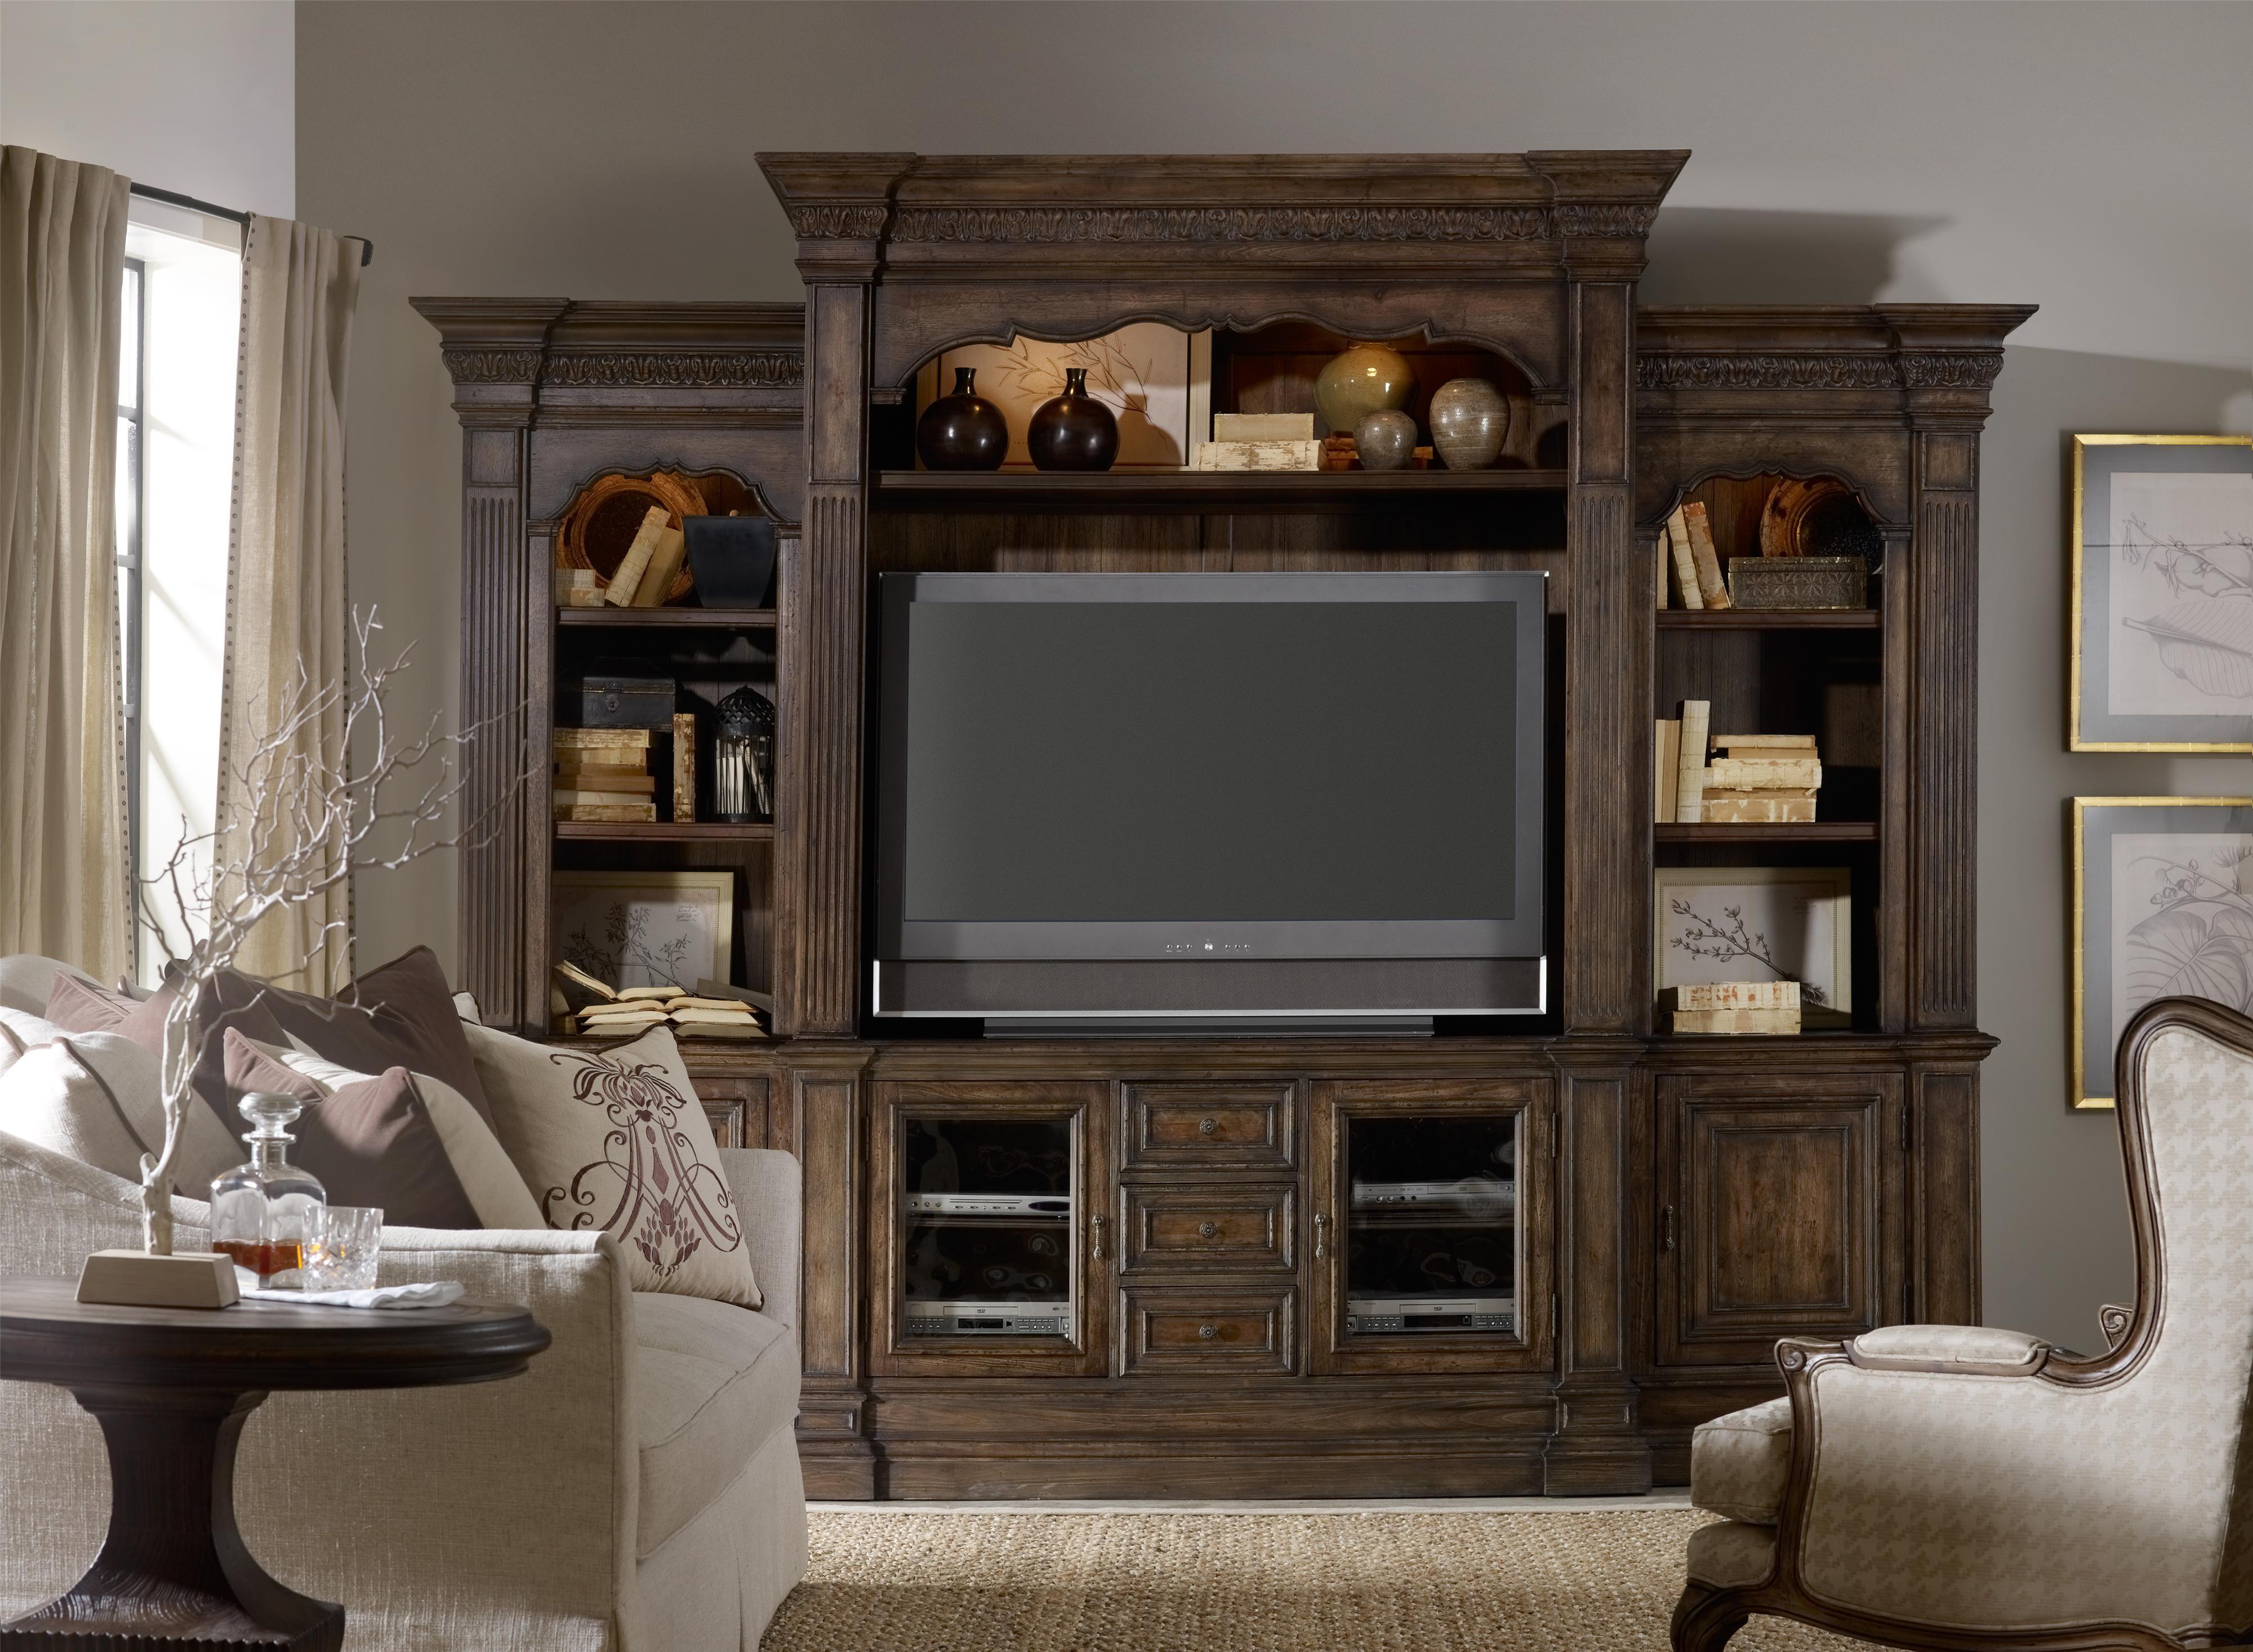 hooker furniture entertainment center. Hooker Furniture: Rhapsody Collection Entertainment #rhapsody #furniture # Furniture Center G